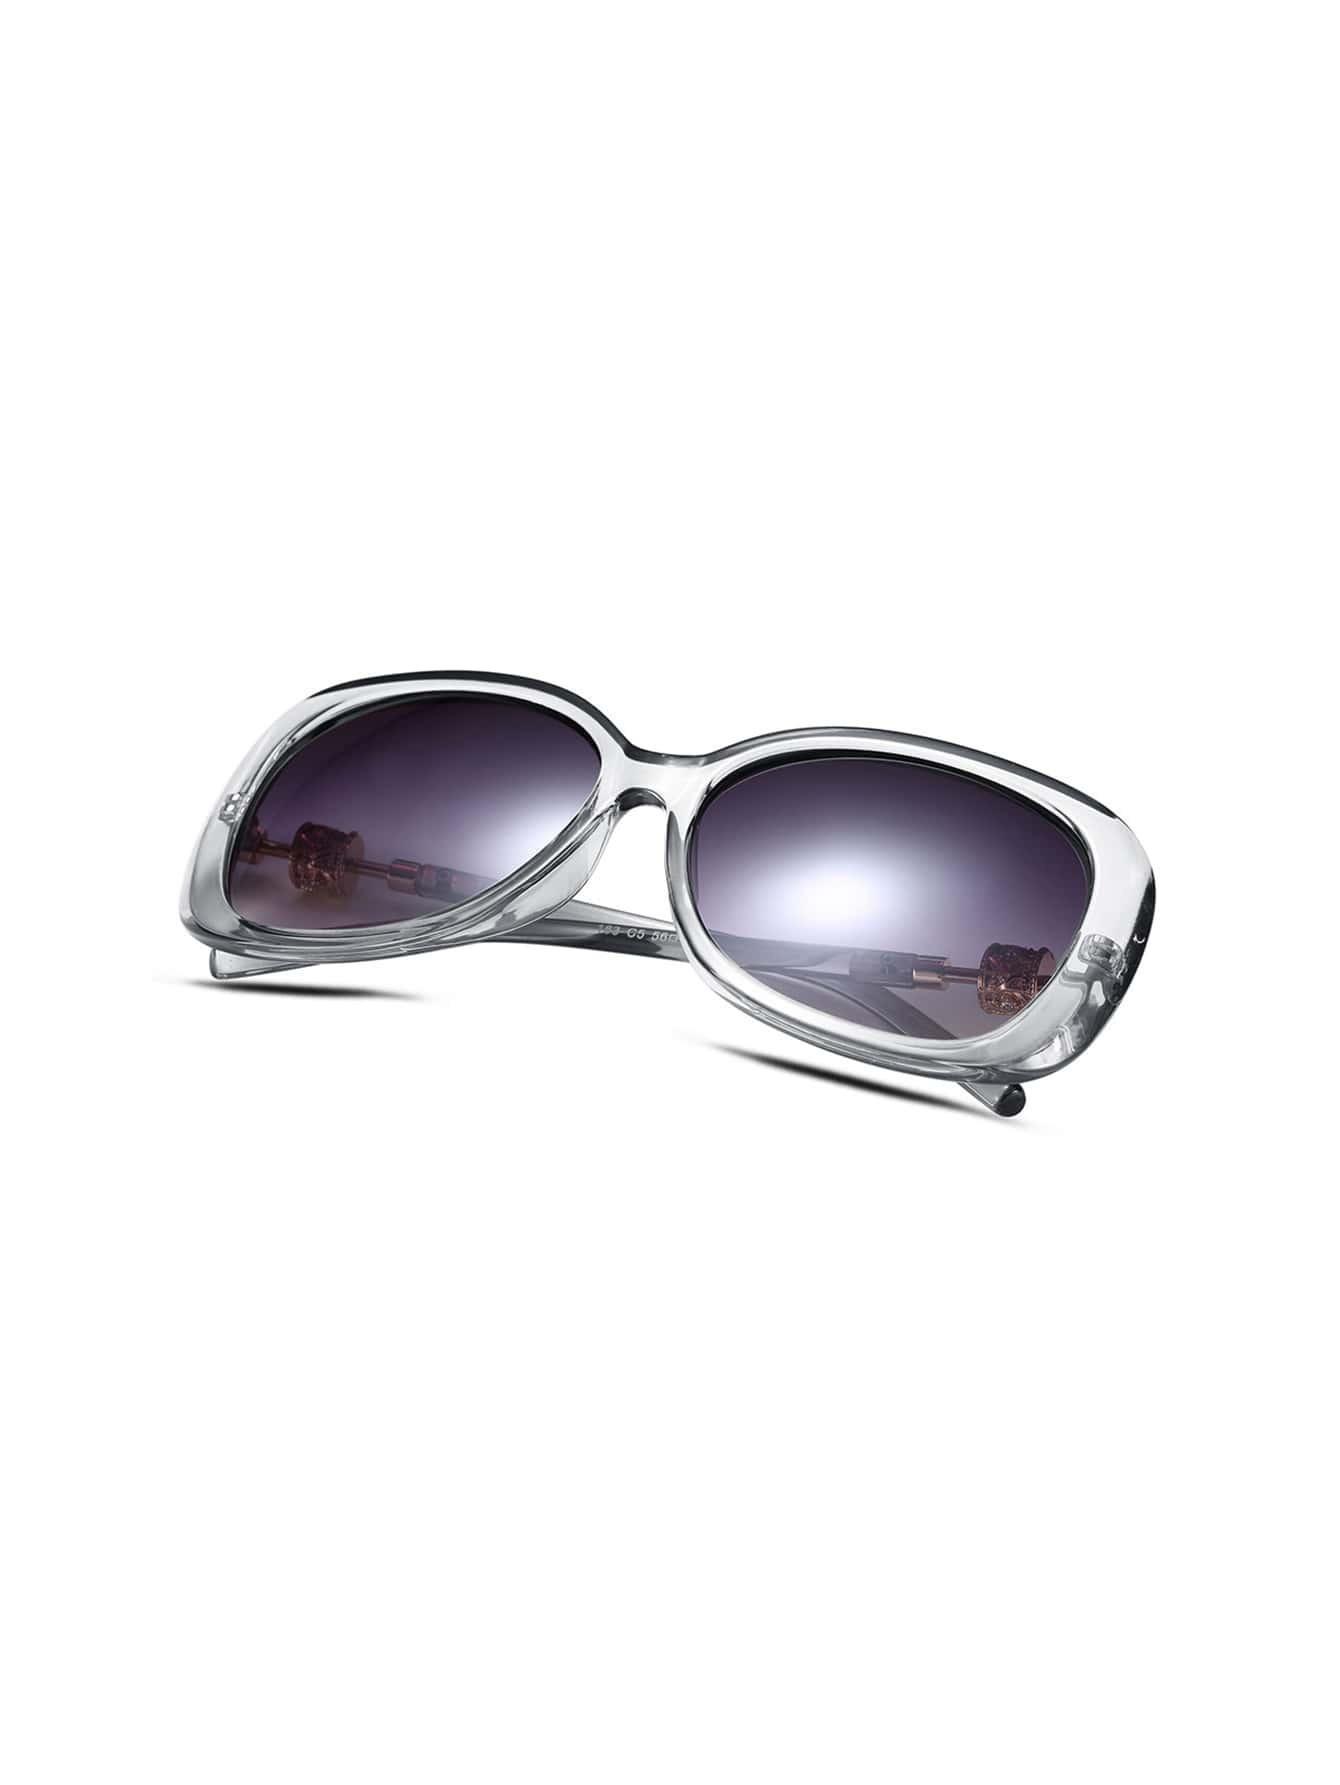 Gold Frame Clear Sunglasses : White Clear Frame Gold Trim Sunglasses -SheIn(Sheinside)